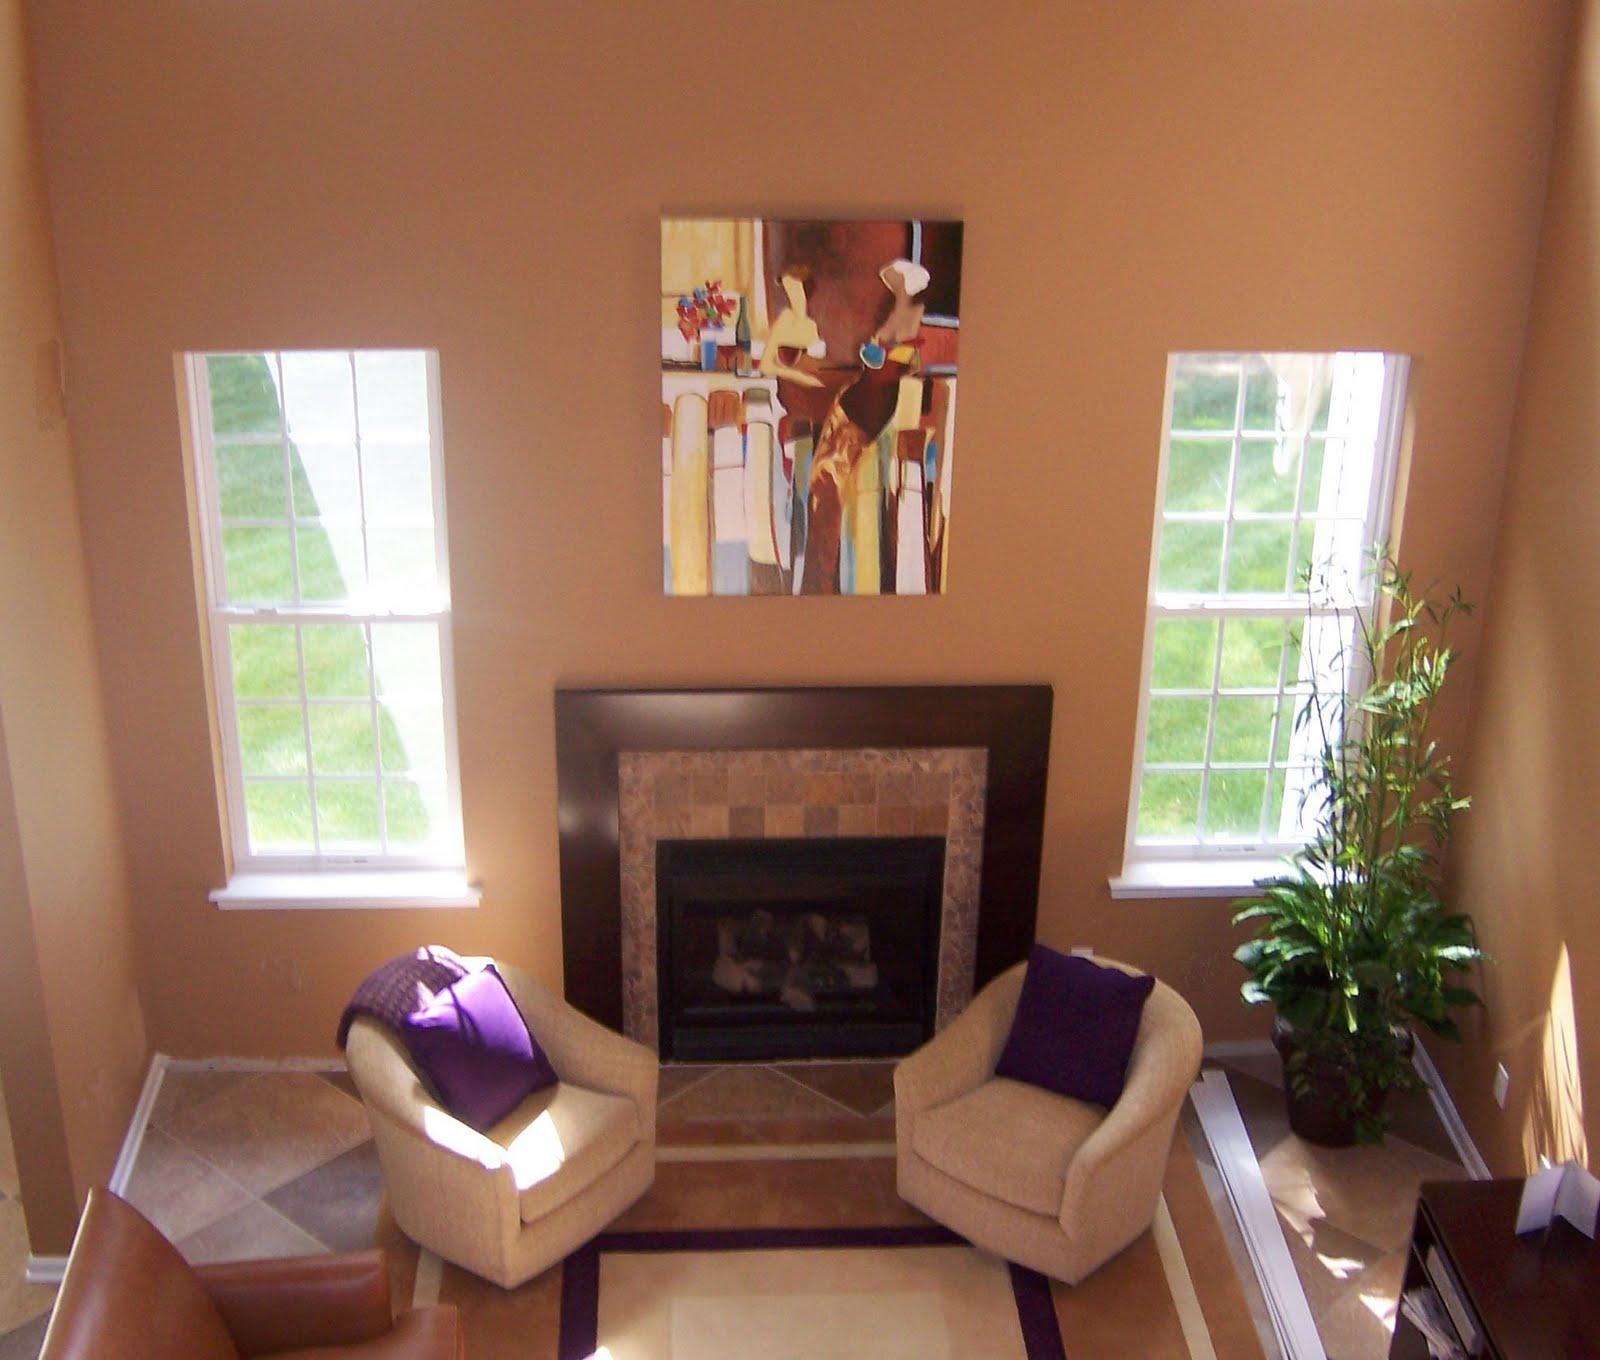 Norma Pofsky On Interior Design